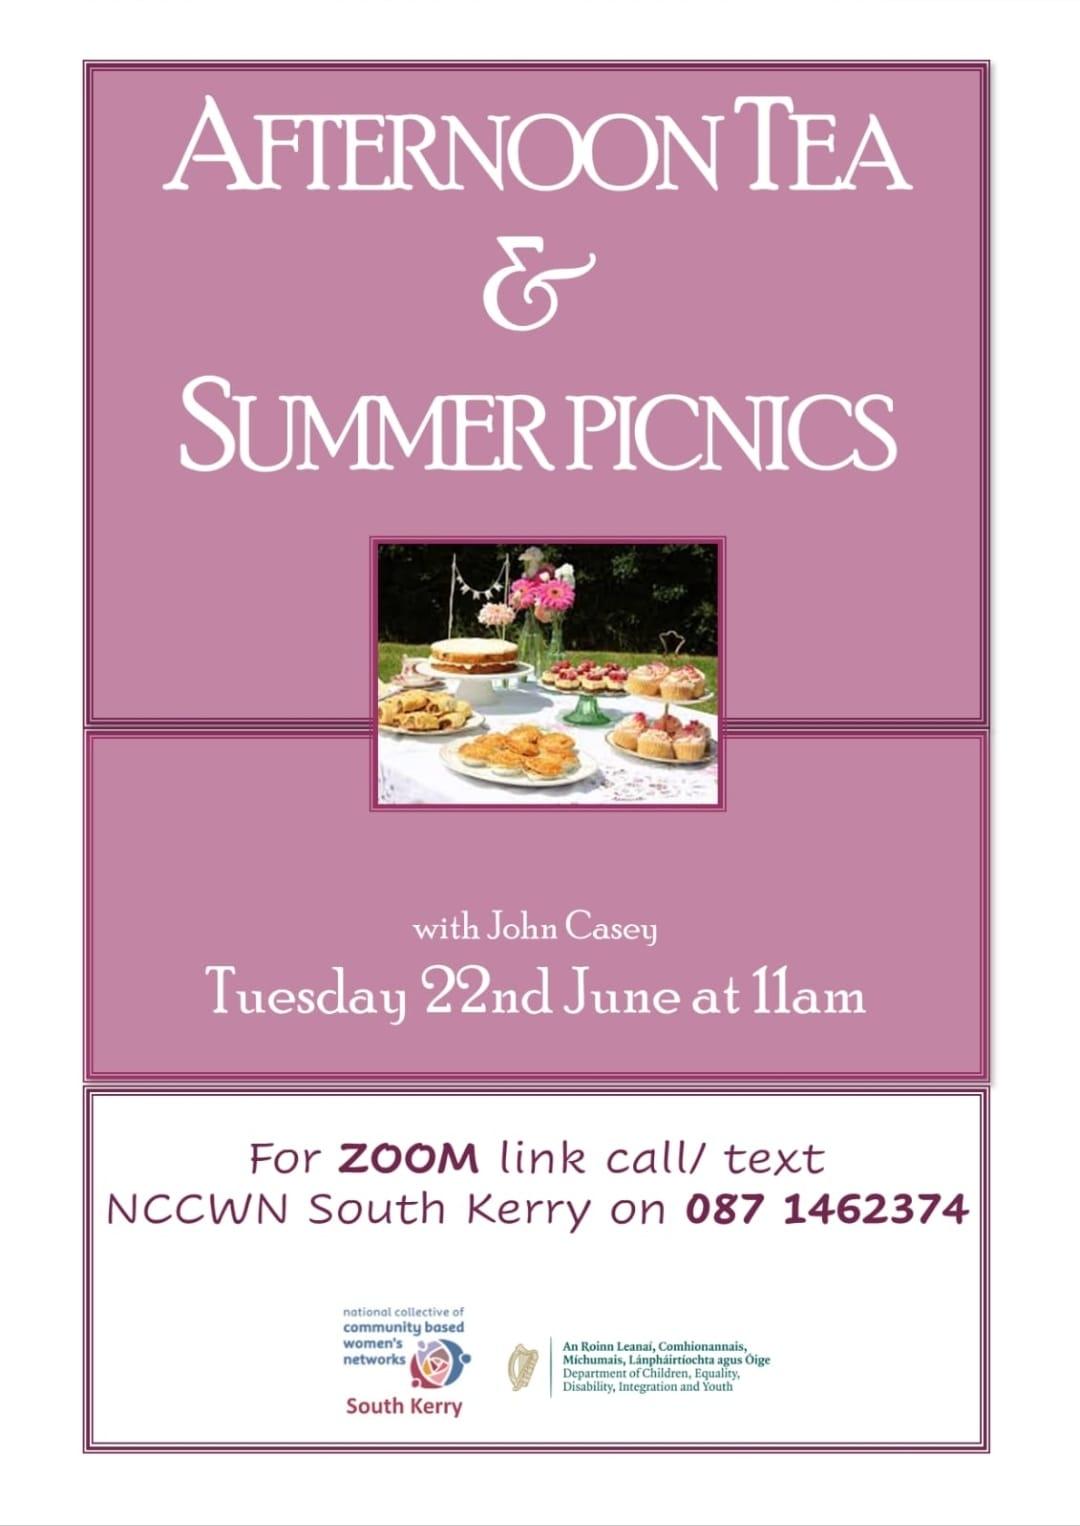 NCCWN South Kerry Afternoon Tea & Summer Picnics